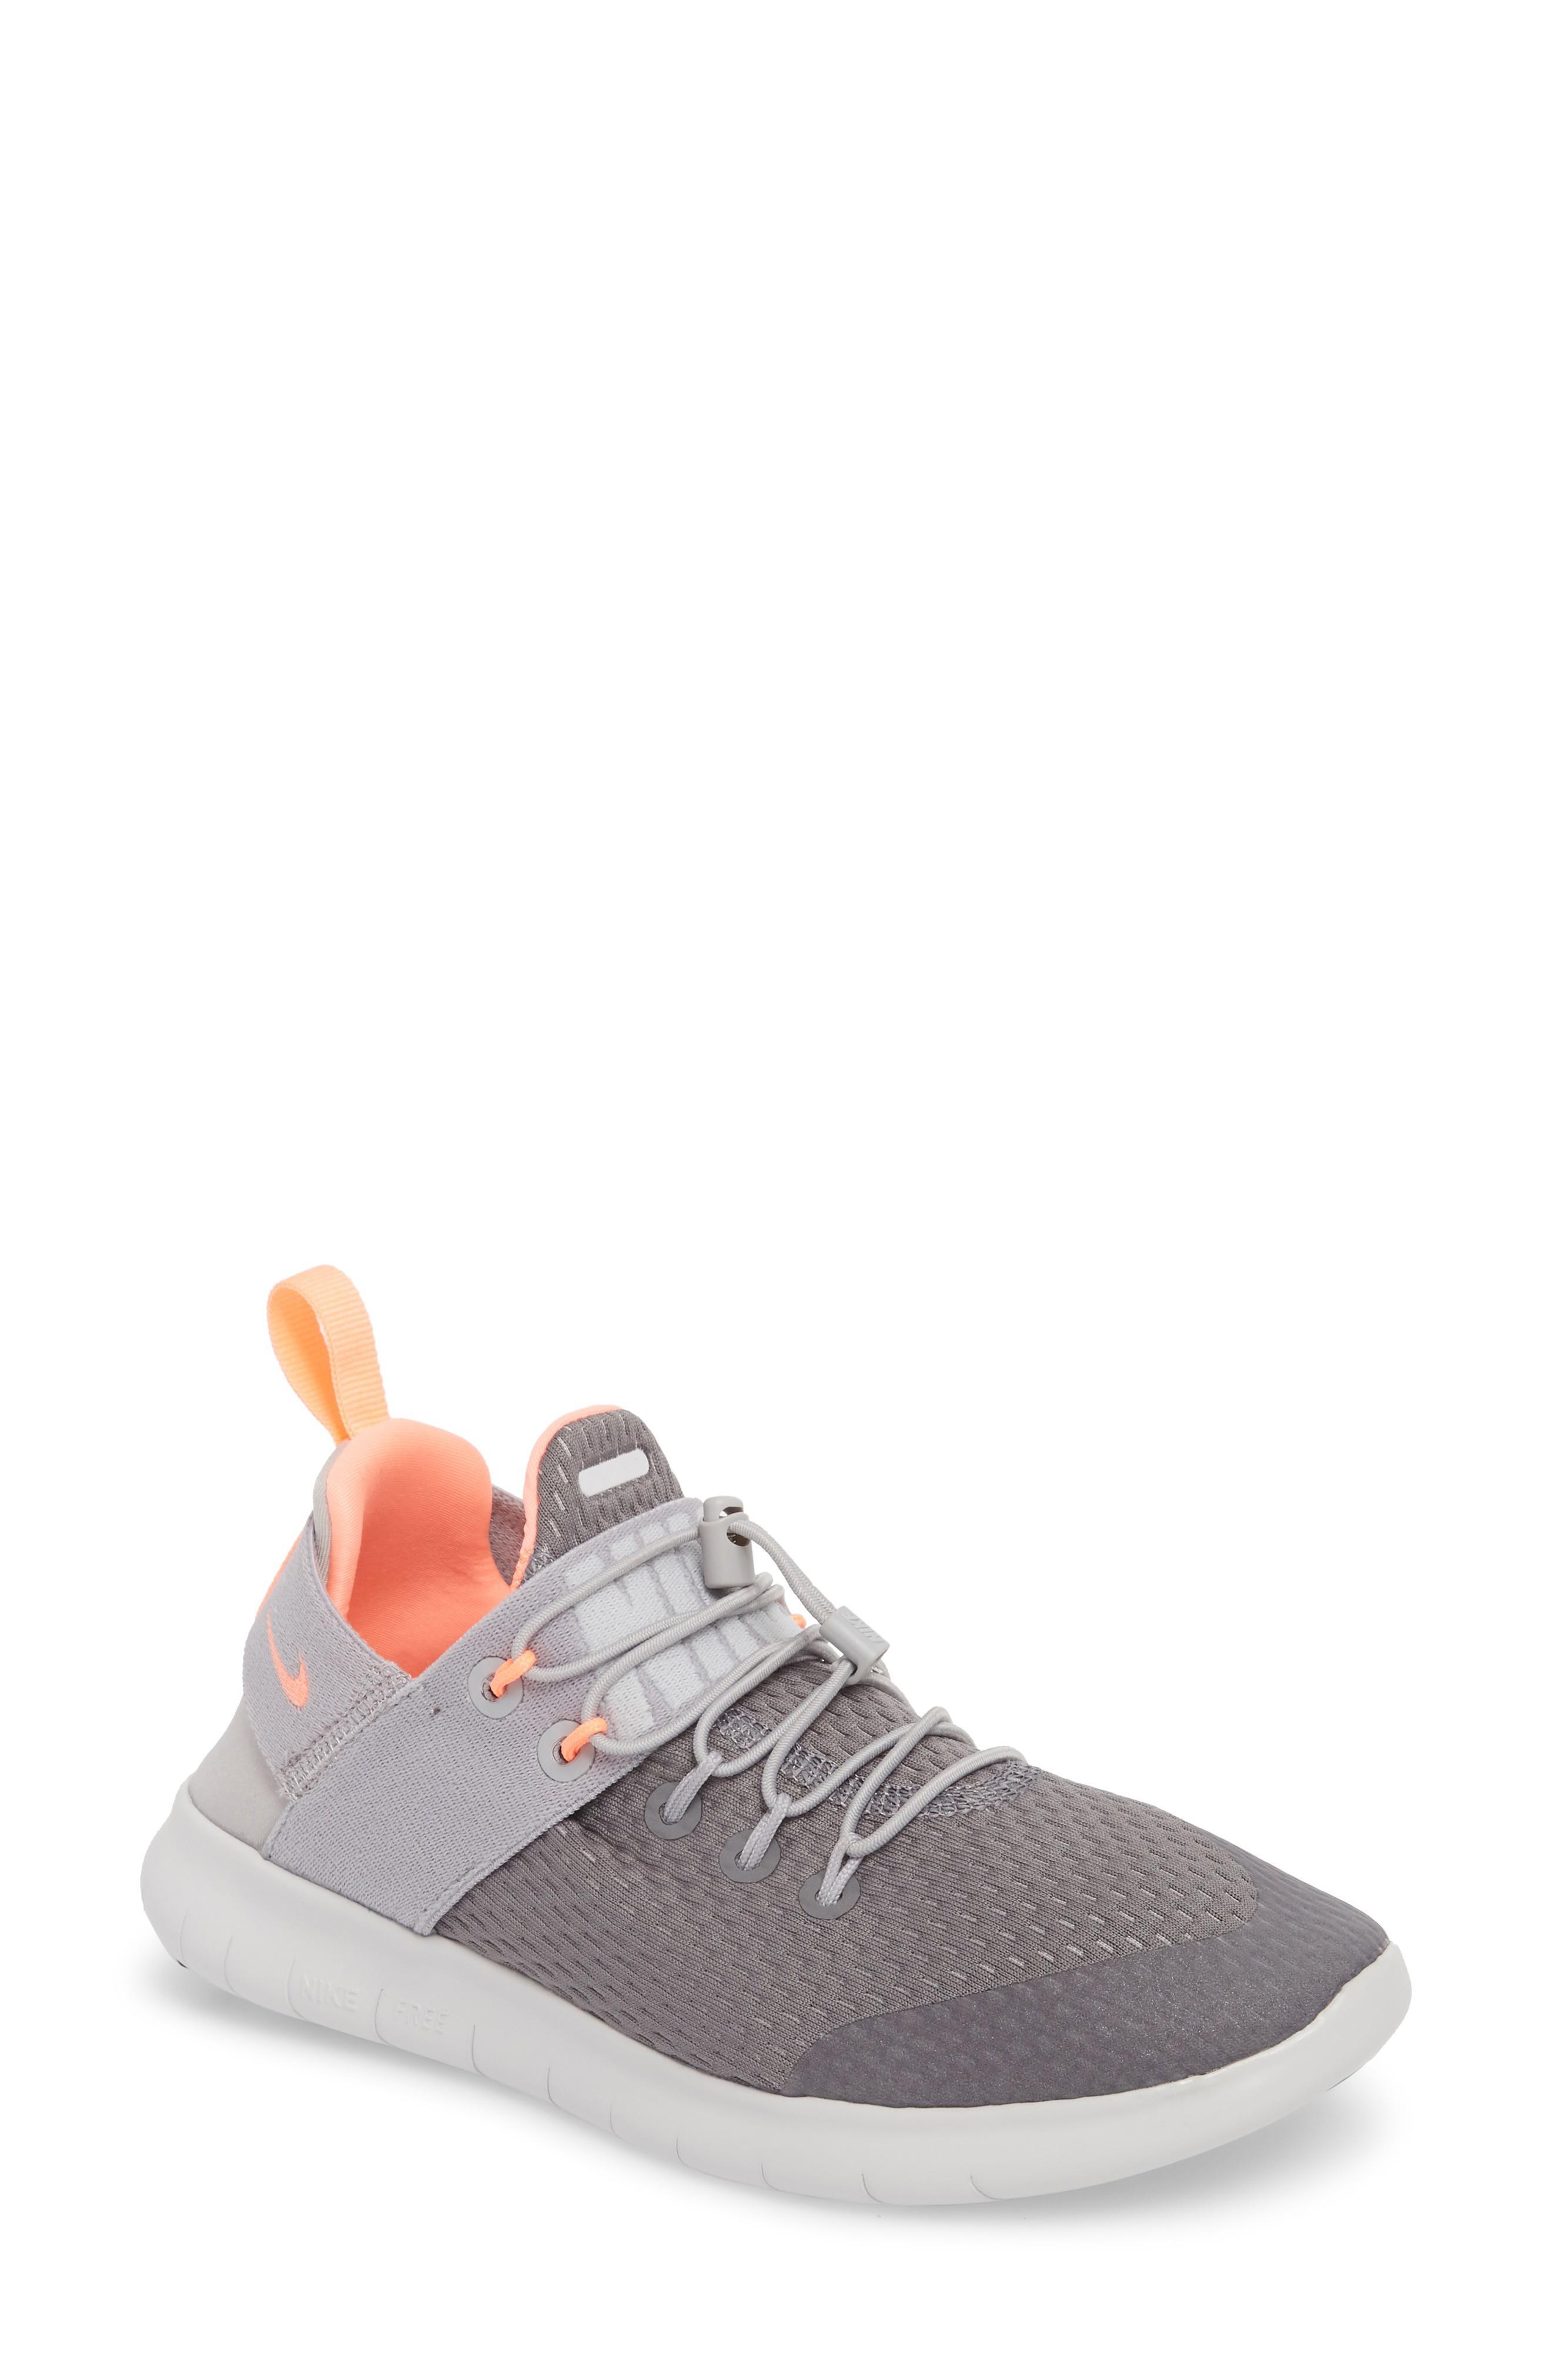 c67aeef8c4b3 Nike Free Rn Cmtr Running Shoe In Gunsmoke  Crimson Pulse